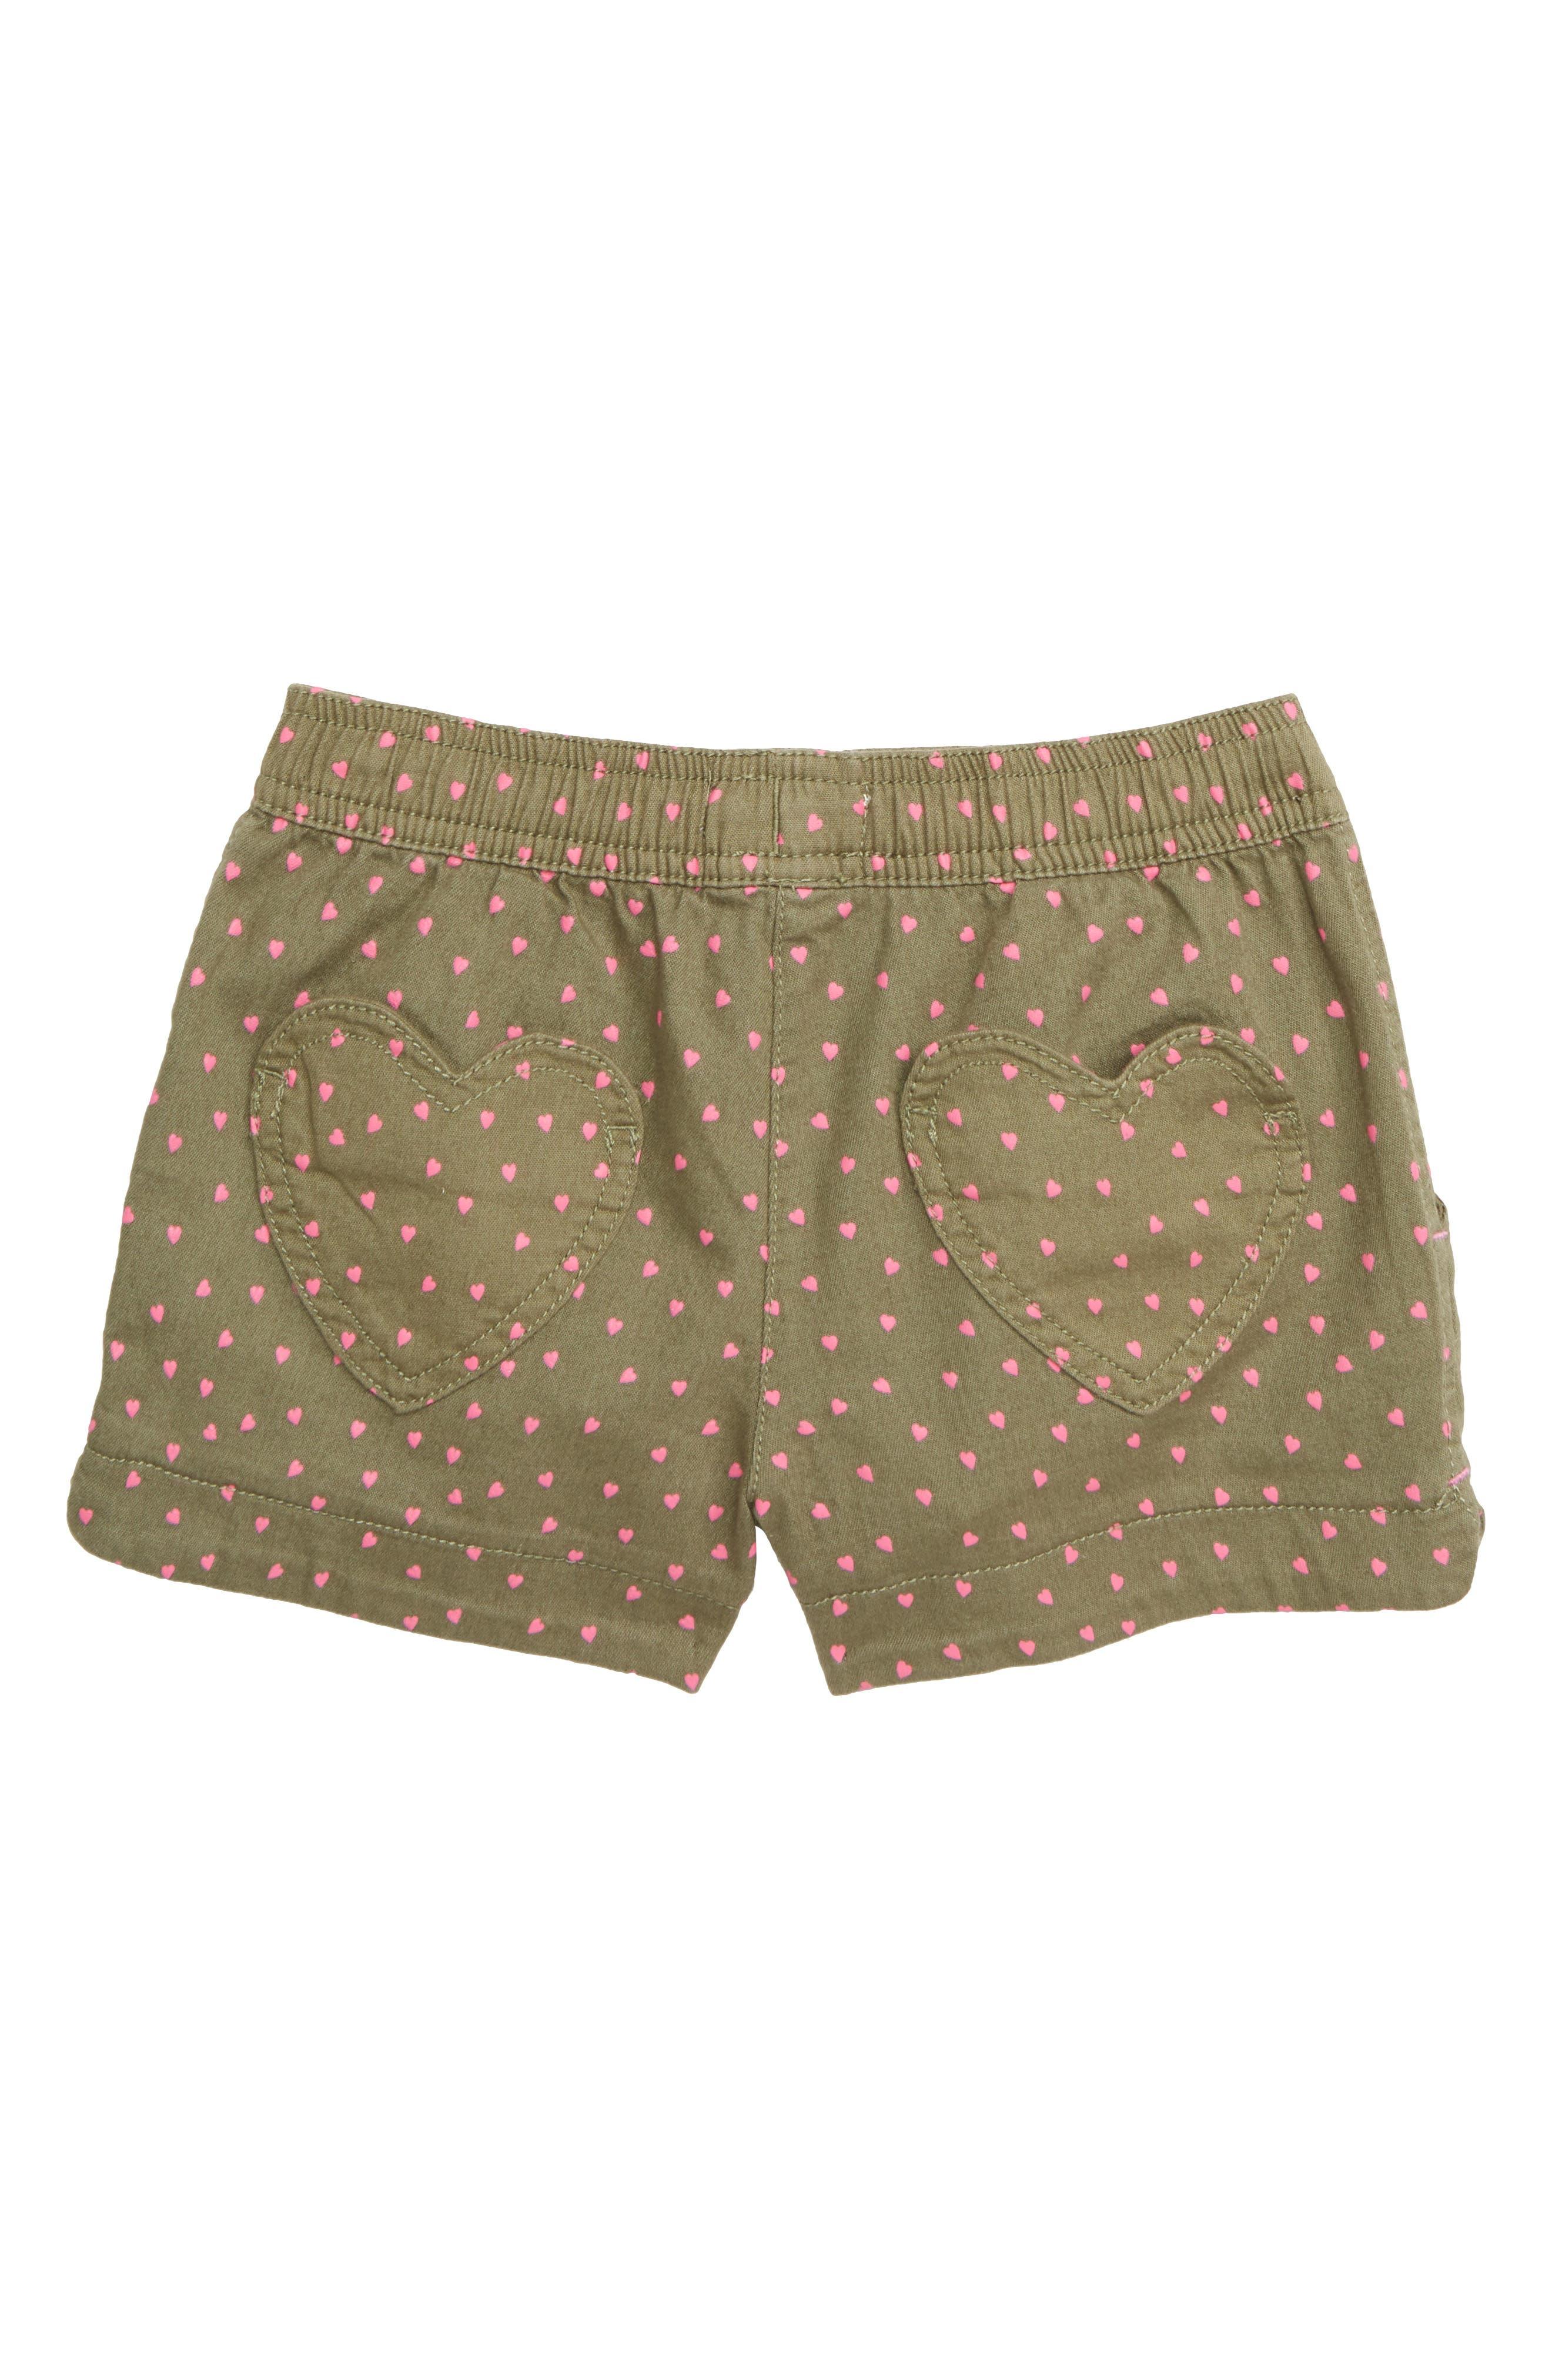 MINI BODEN, Heart Pocket Shorts, Alternate thumbnail 2, color, GRN ARMY GREEN SWEET HEARTS